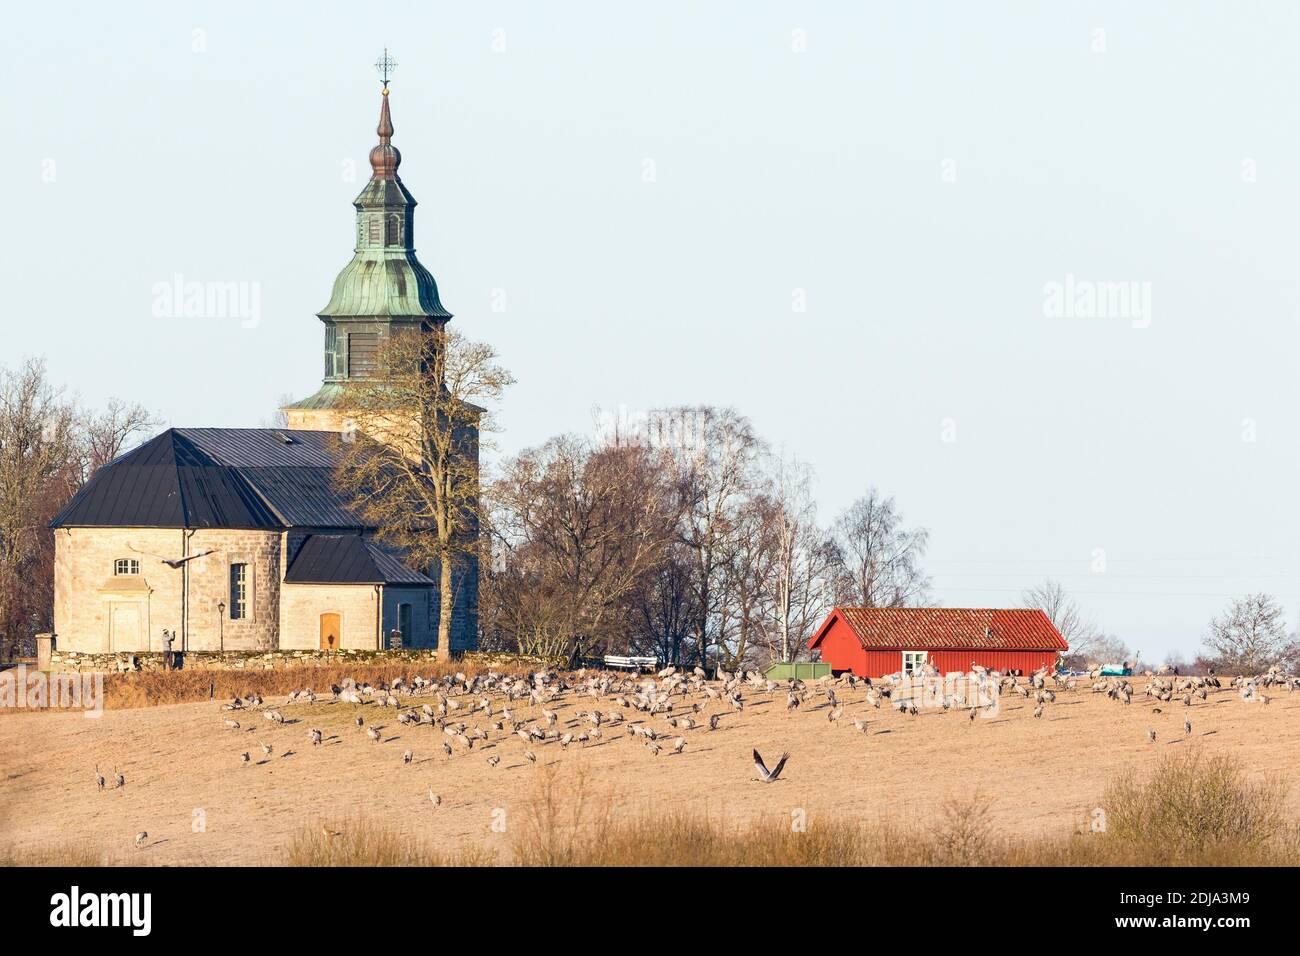 Cranes on the field at Bjurum church by the lake Hornborgasjon Stock Photo